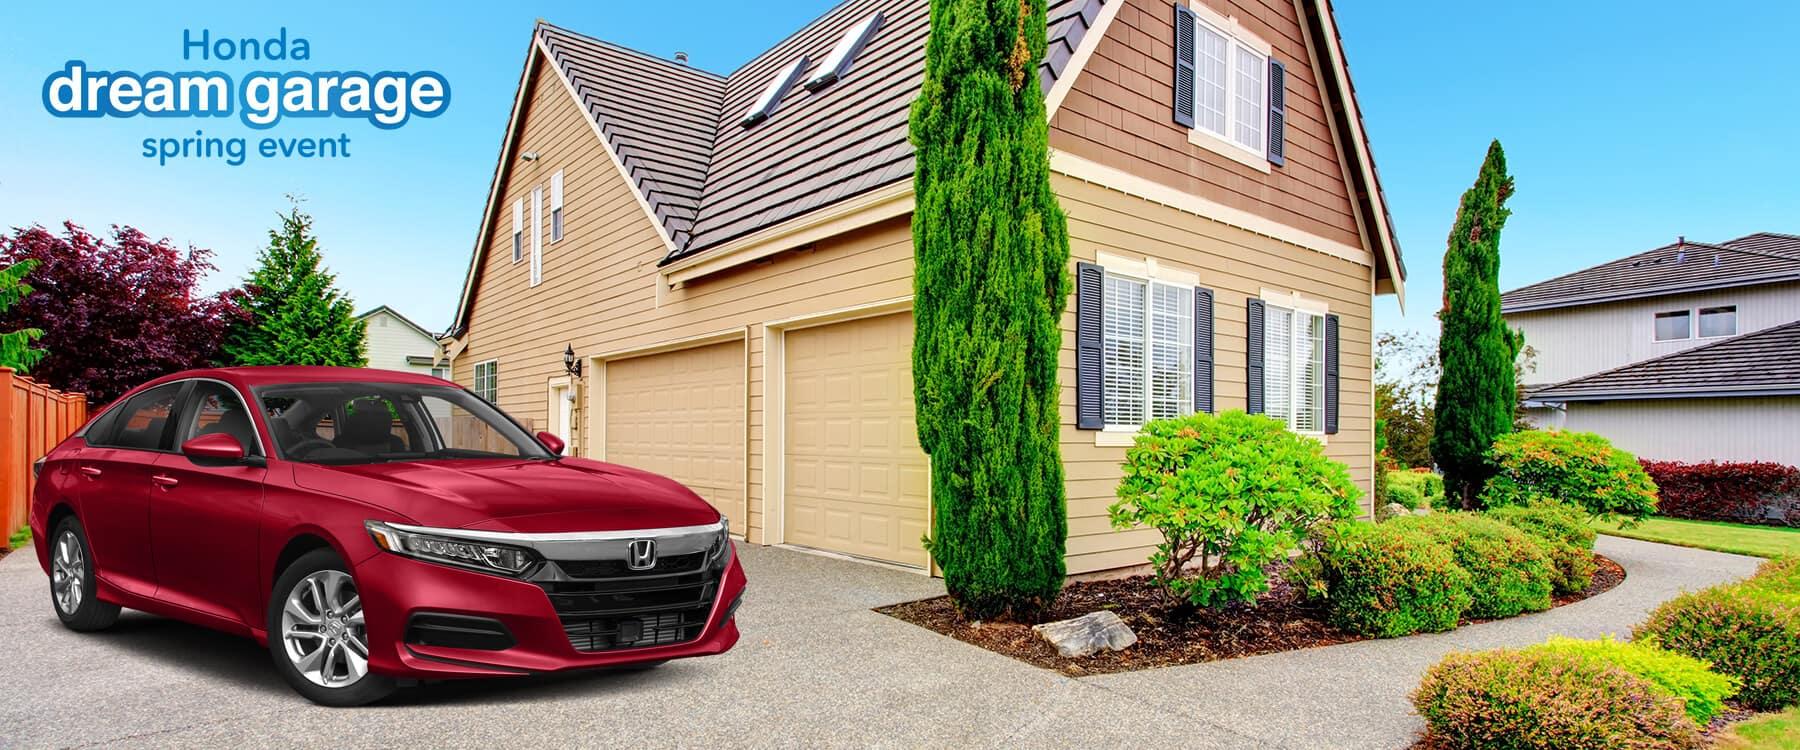 Honda Dream Garage Spring Event 2019 Accord Slider